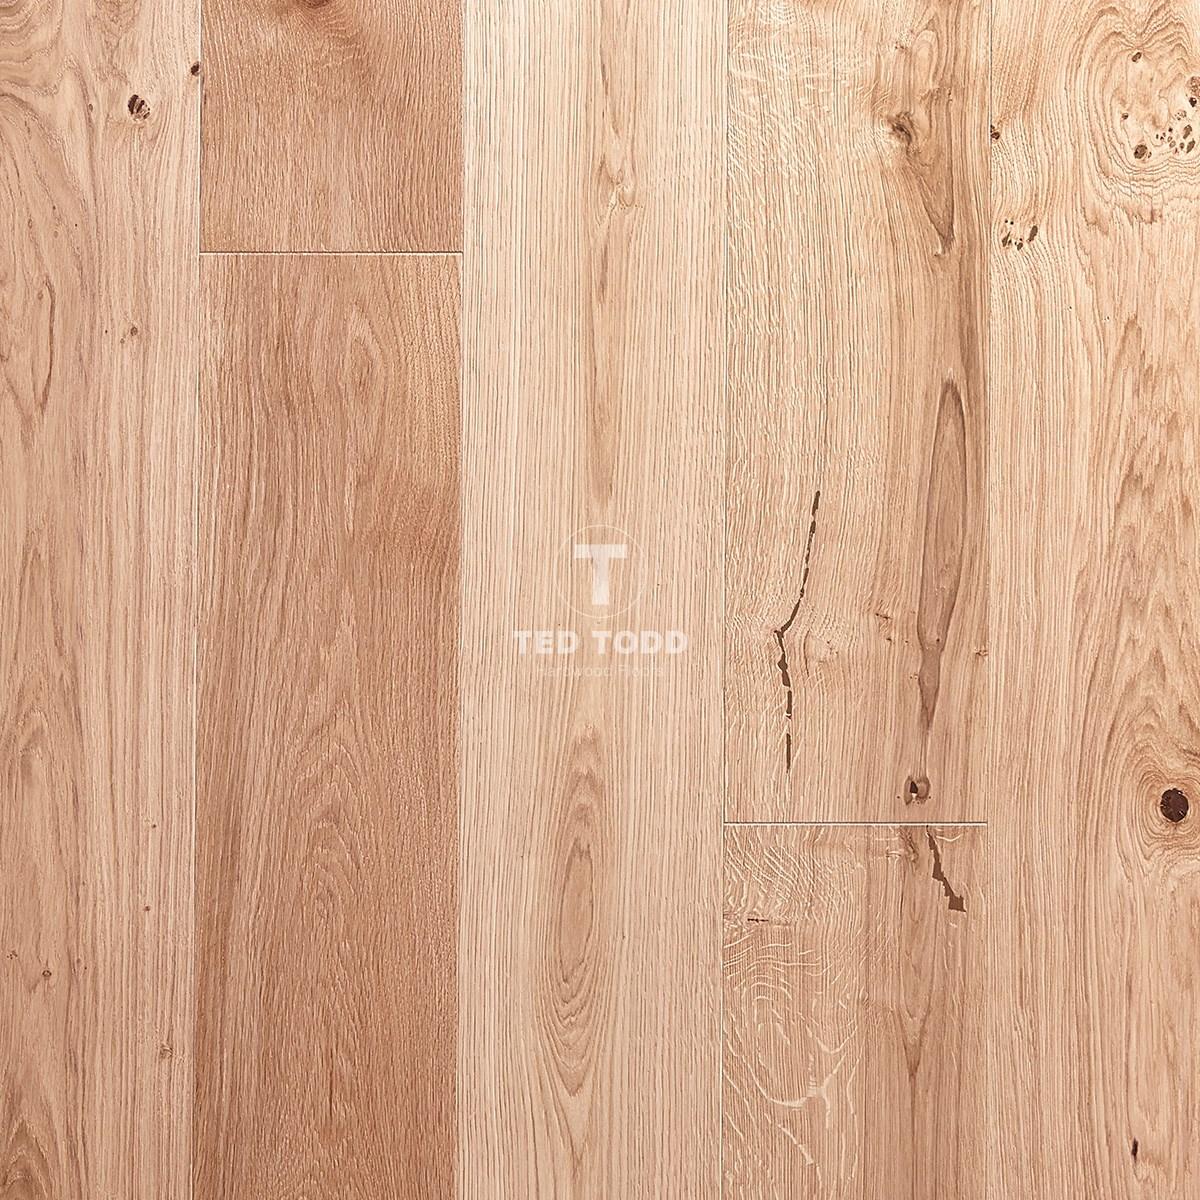 Engineered Flooring New Ted Todd Engineered Flooring